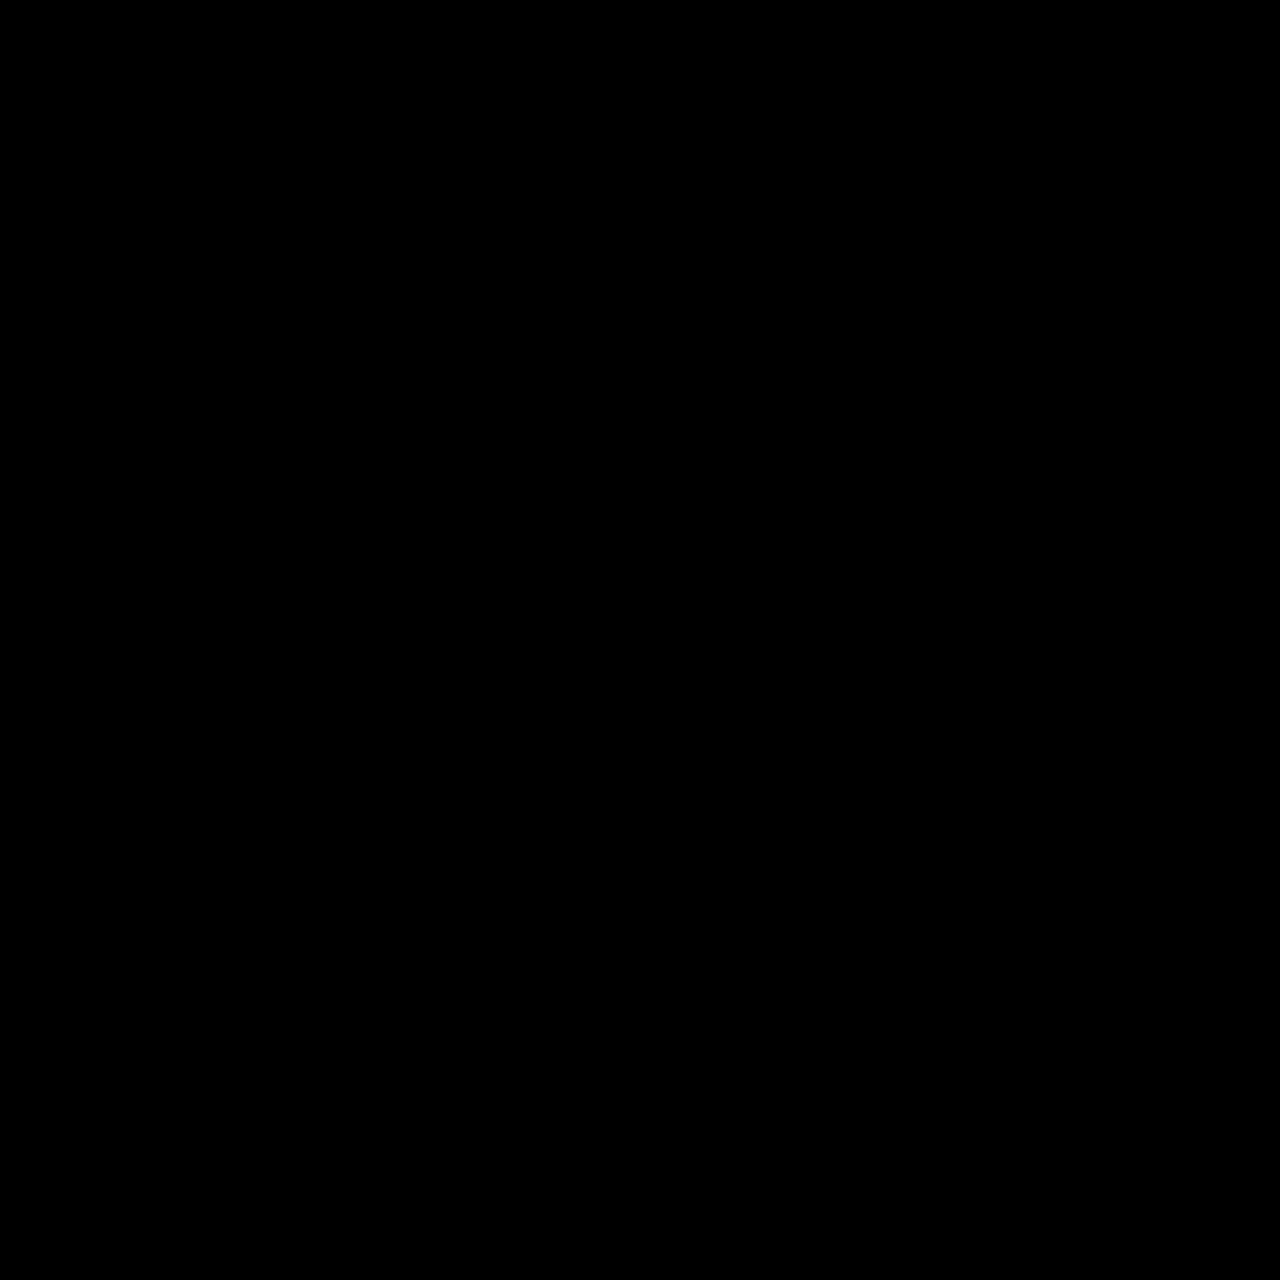 B8F12NC214(783522)